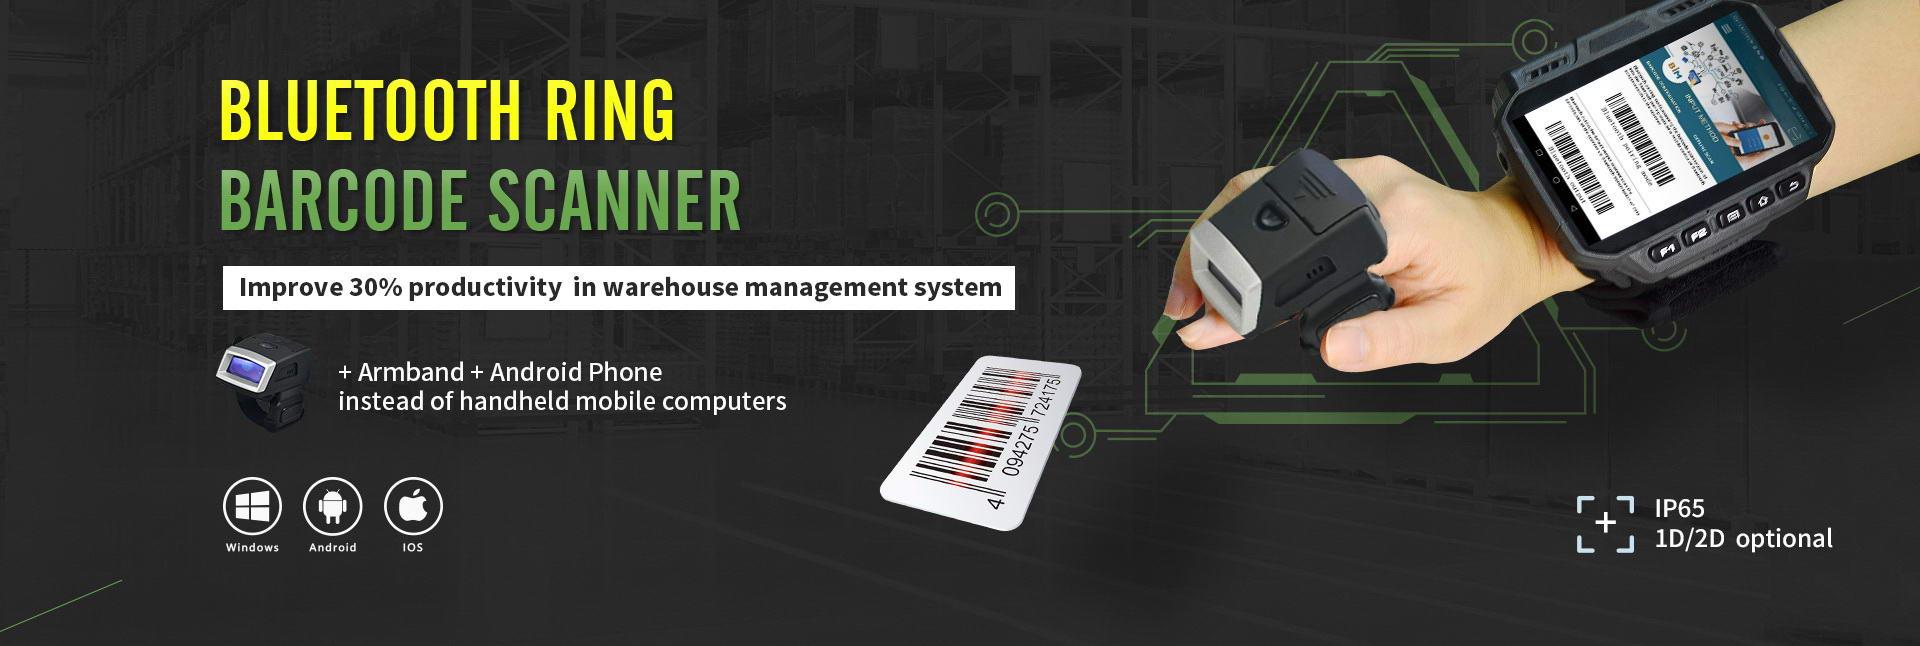 Barcode Scanner, Ring Barcode Scanner, Wireless Barcode Scanner